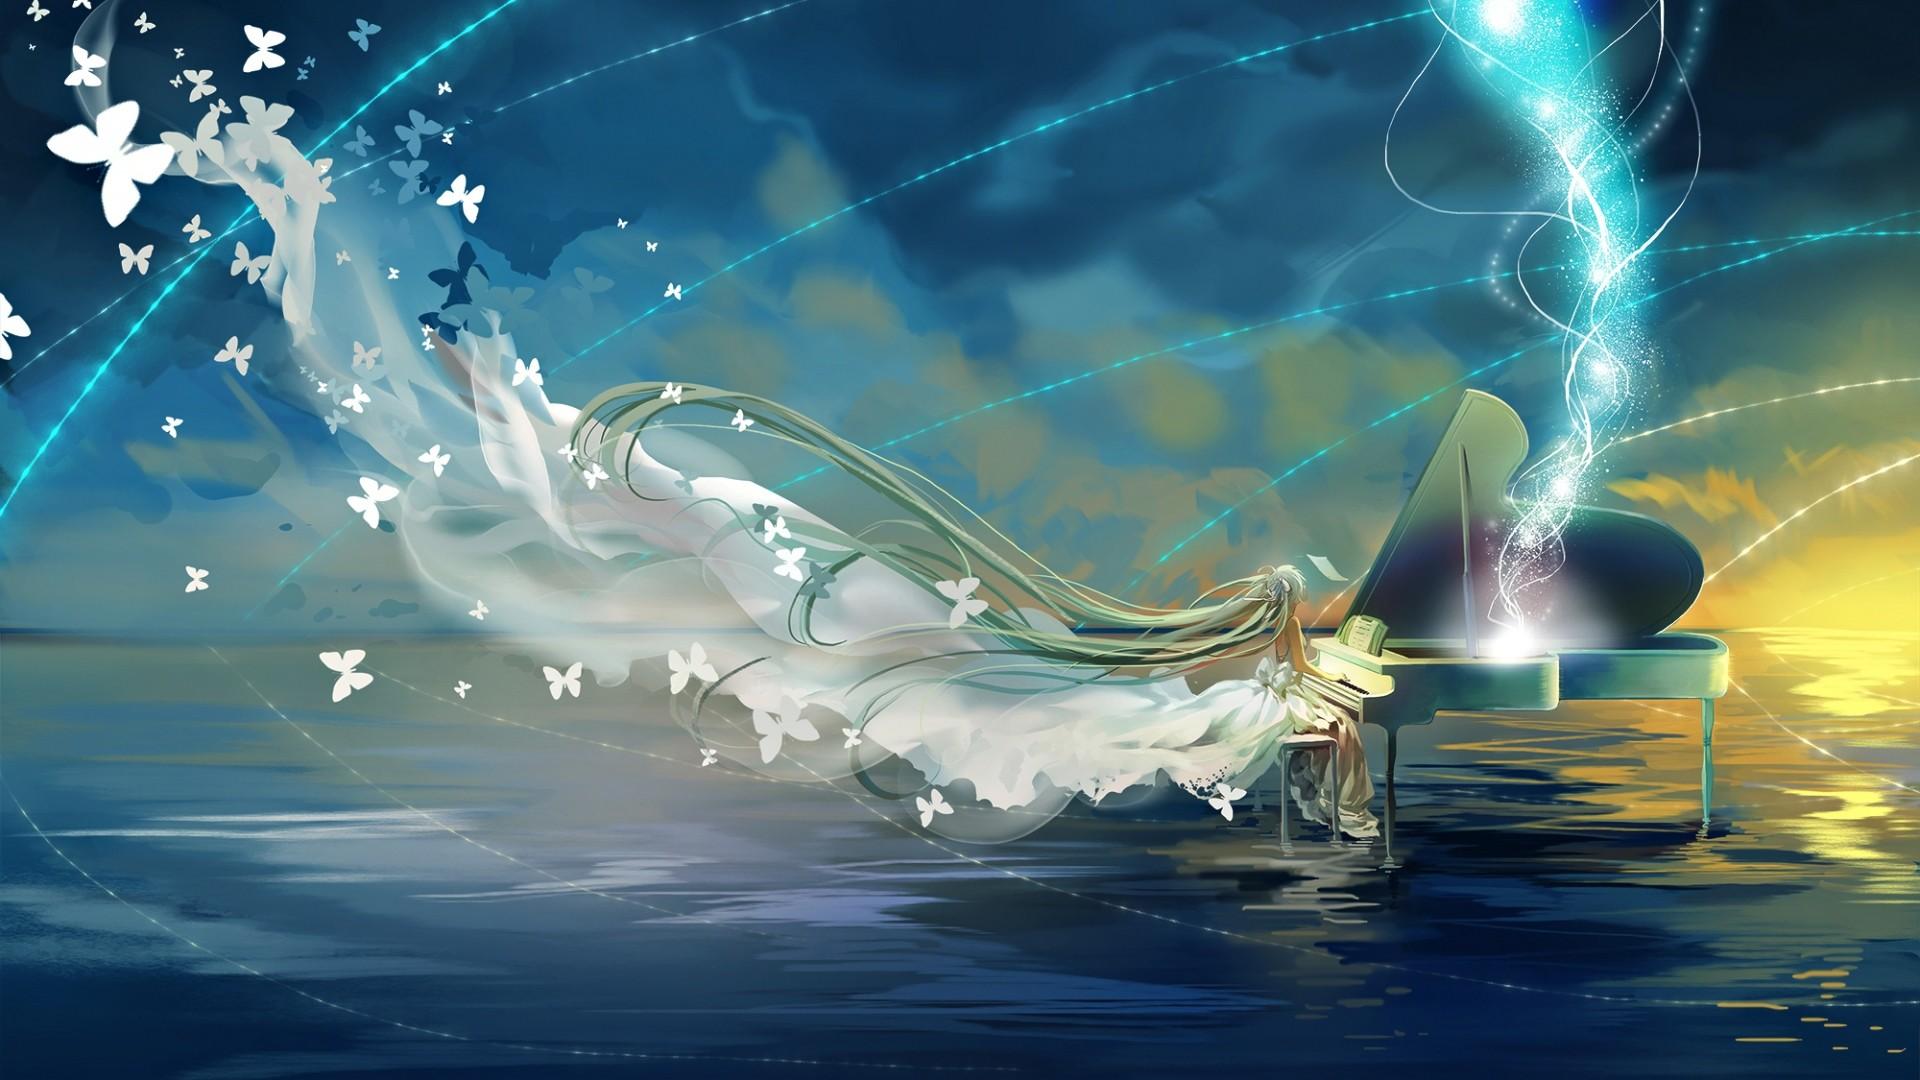 Download Wallpaper Vocaloid, Hatsune miku, Piano, Sky, Butterfly  Full HD 1080p